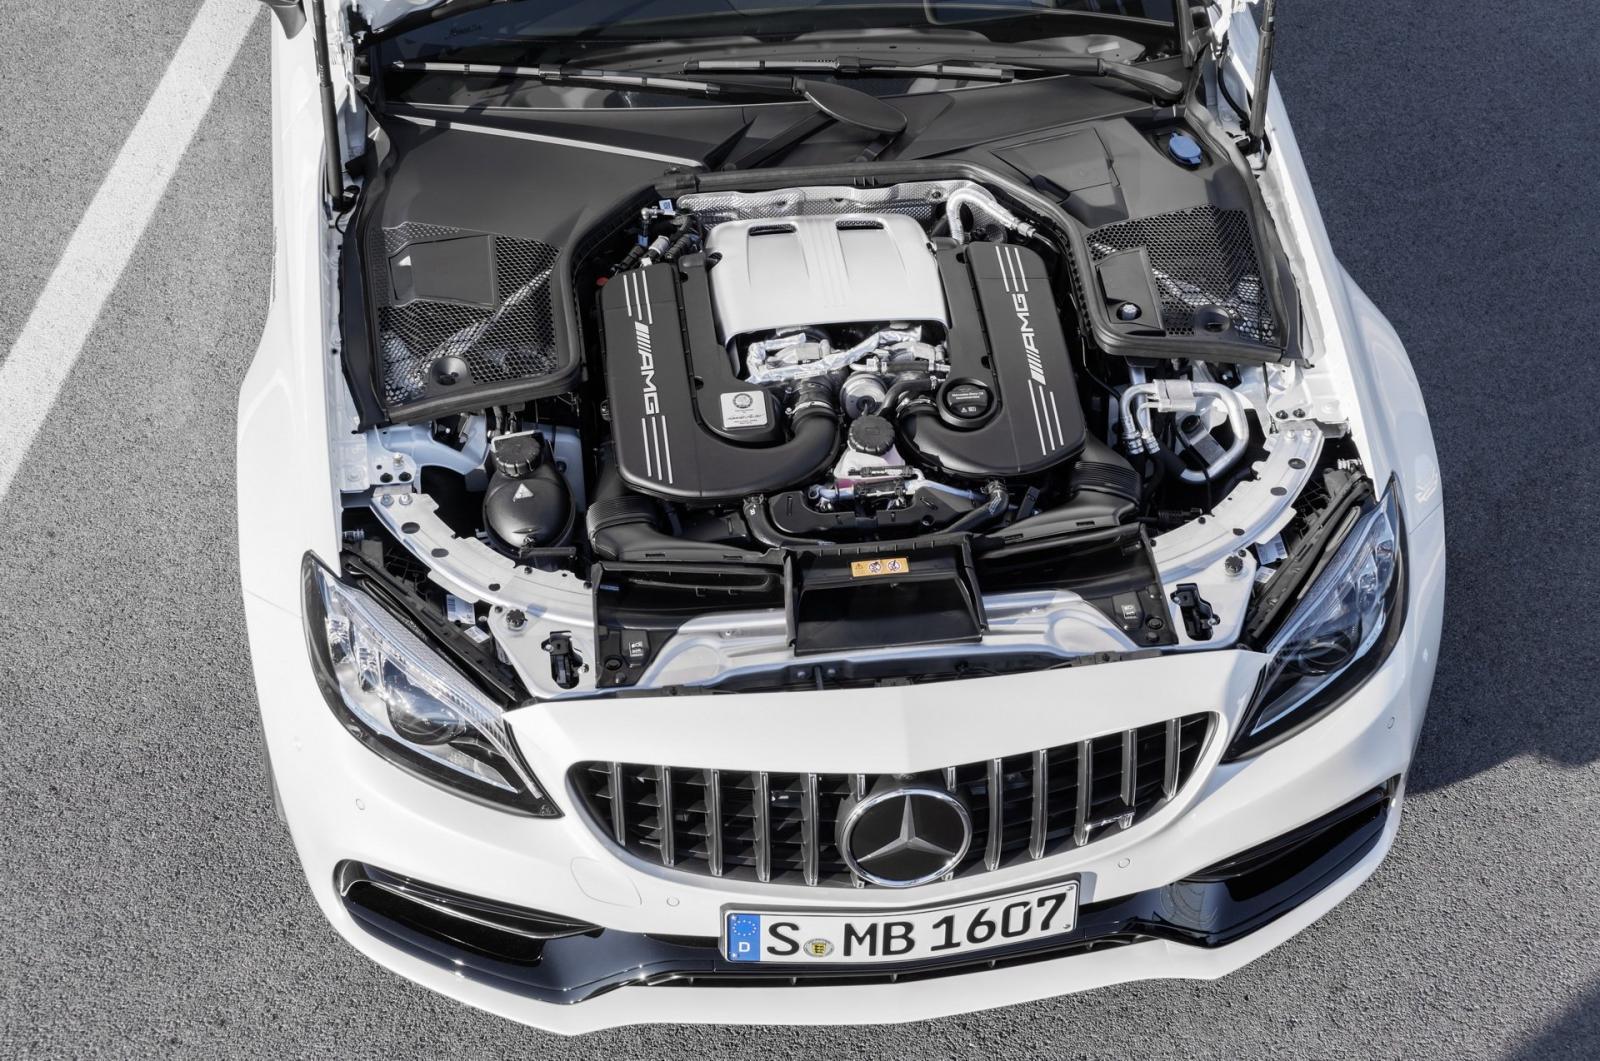 Mercedes-AMG Motor